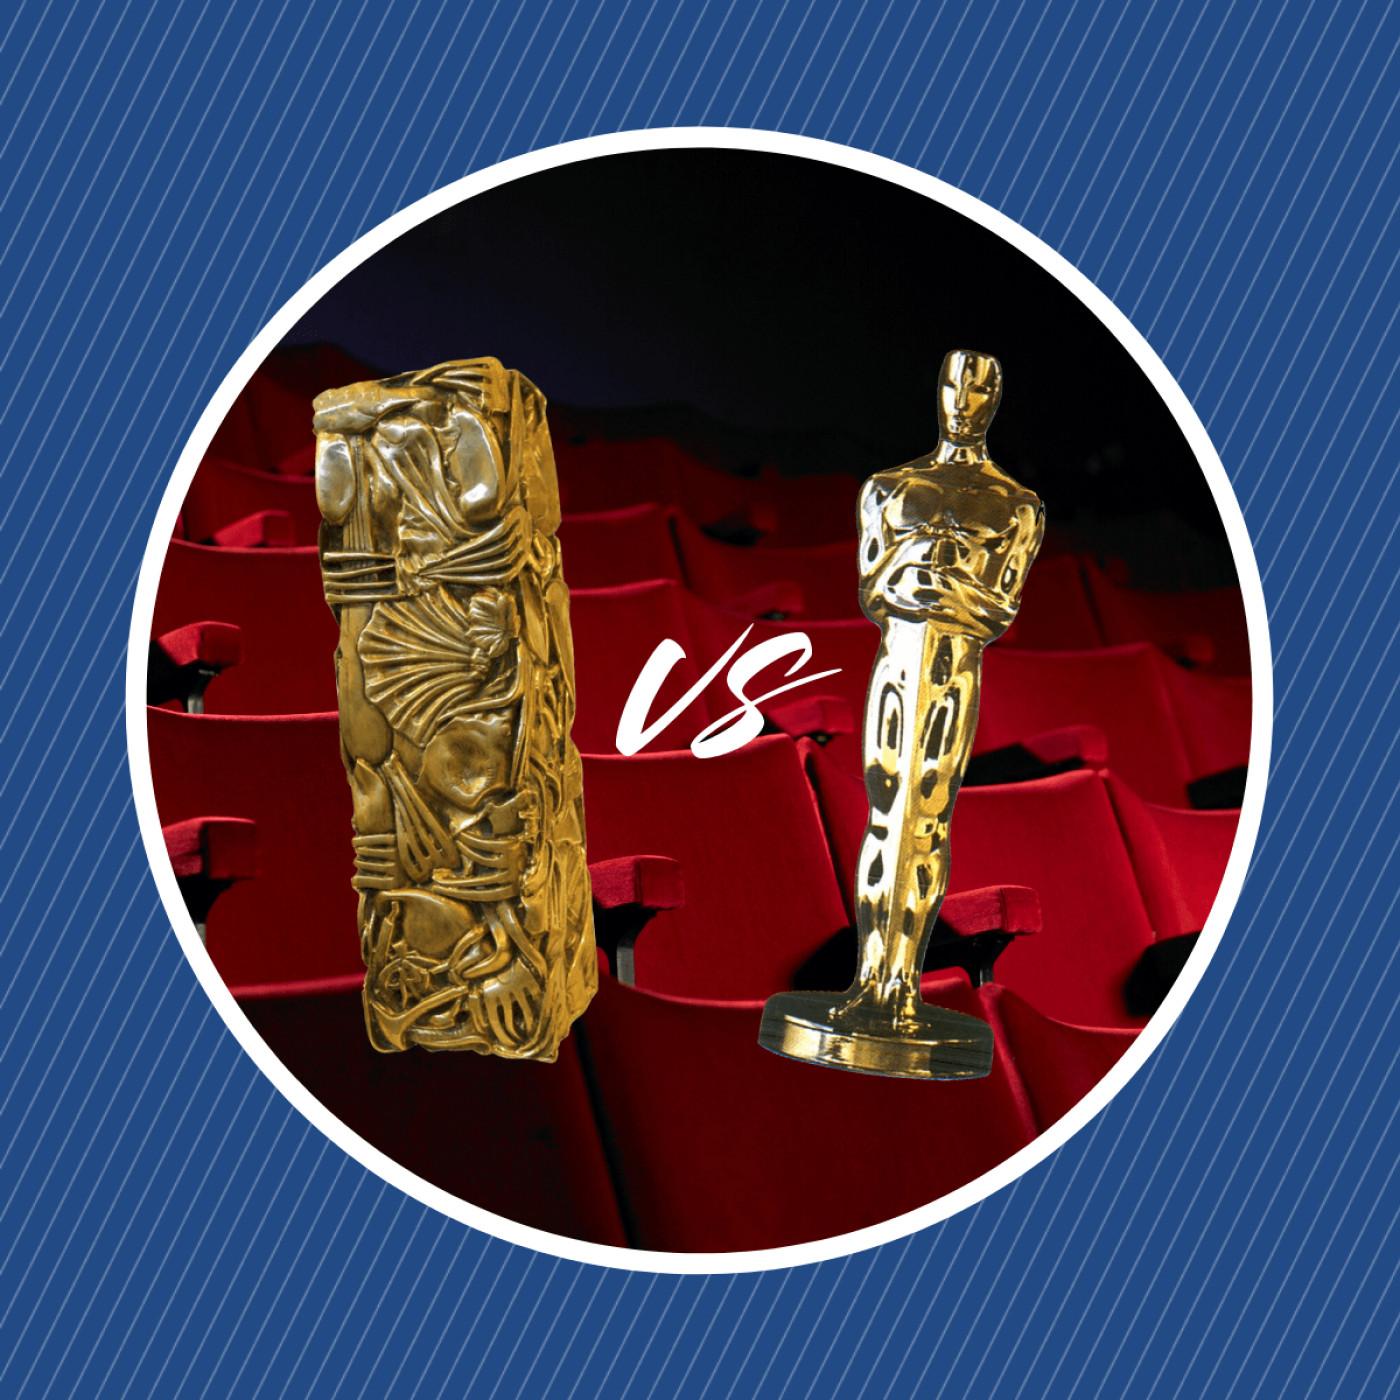 César vs. Oscar